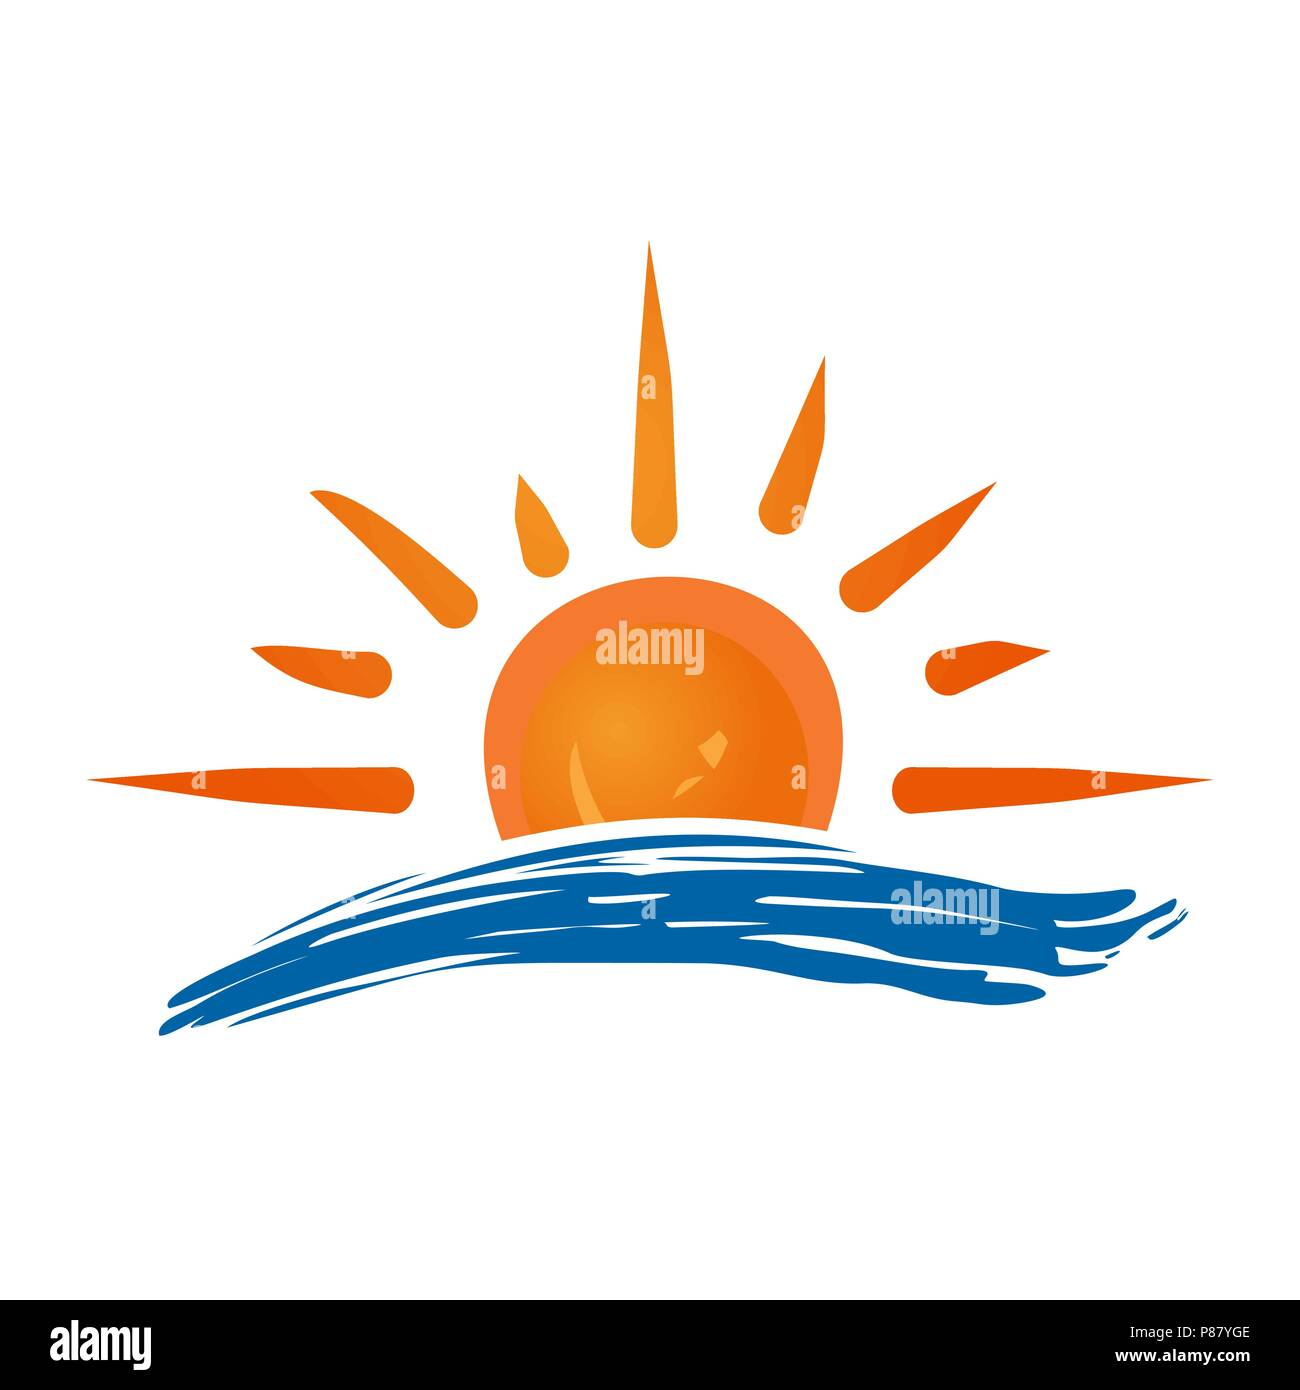 Sun and sea logo icon. Handmade grunge icon isolated on white background.  Sunrise over the sea. Editable vector illustration - Stock Vector